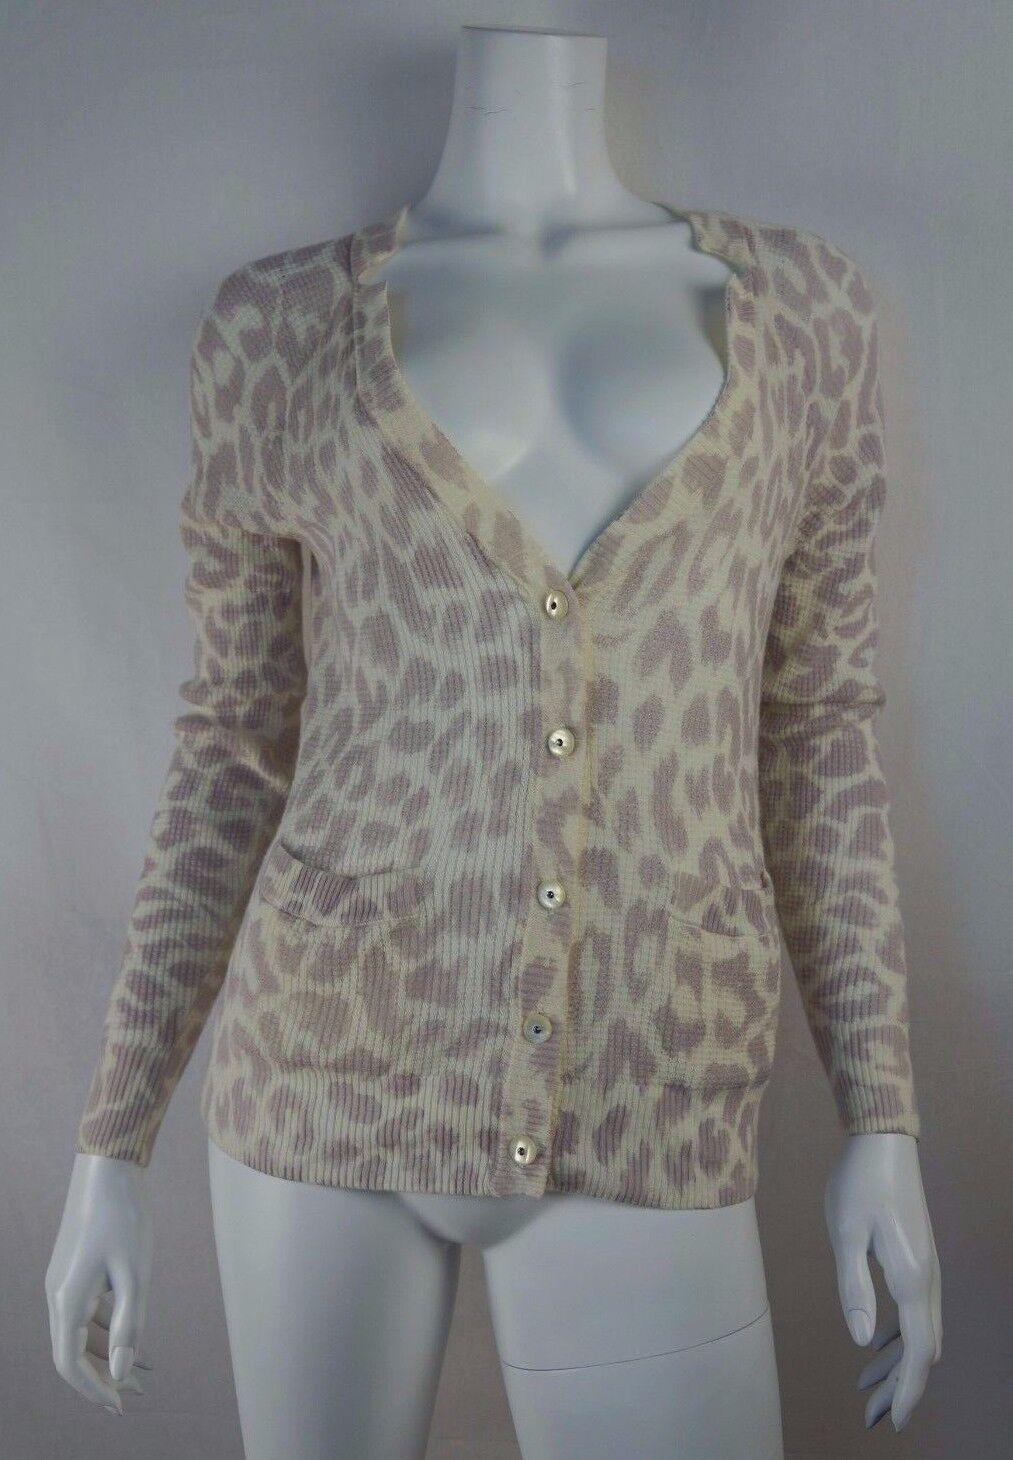 REBECCA TAYLOR Ivory Ivory Ivory Purple Leopard Print Cardigan Sweater - size M 5cdecf